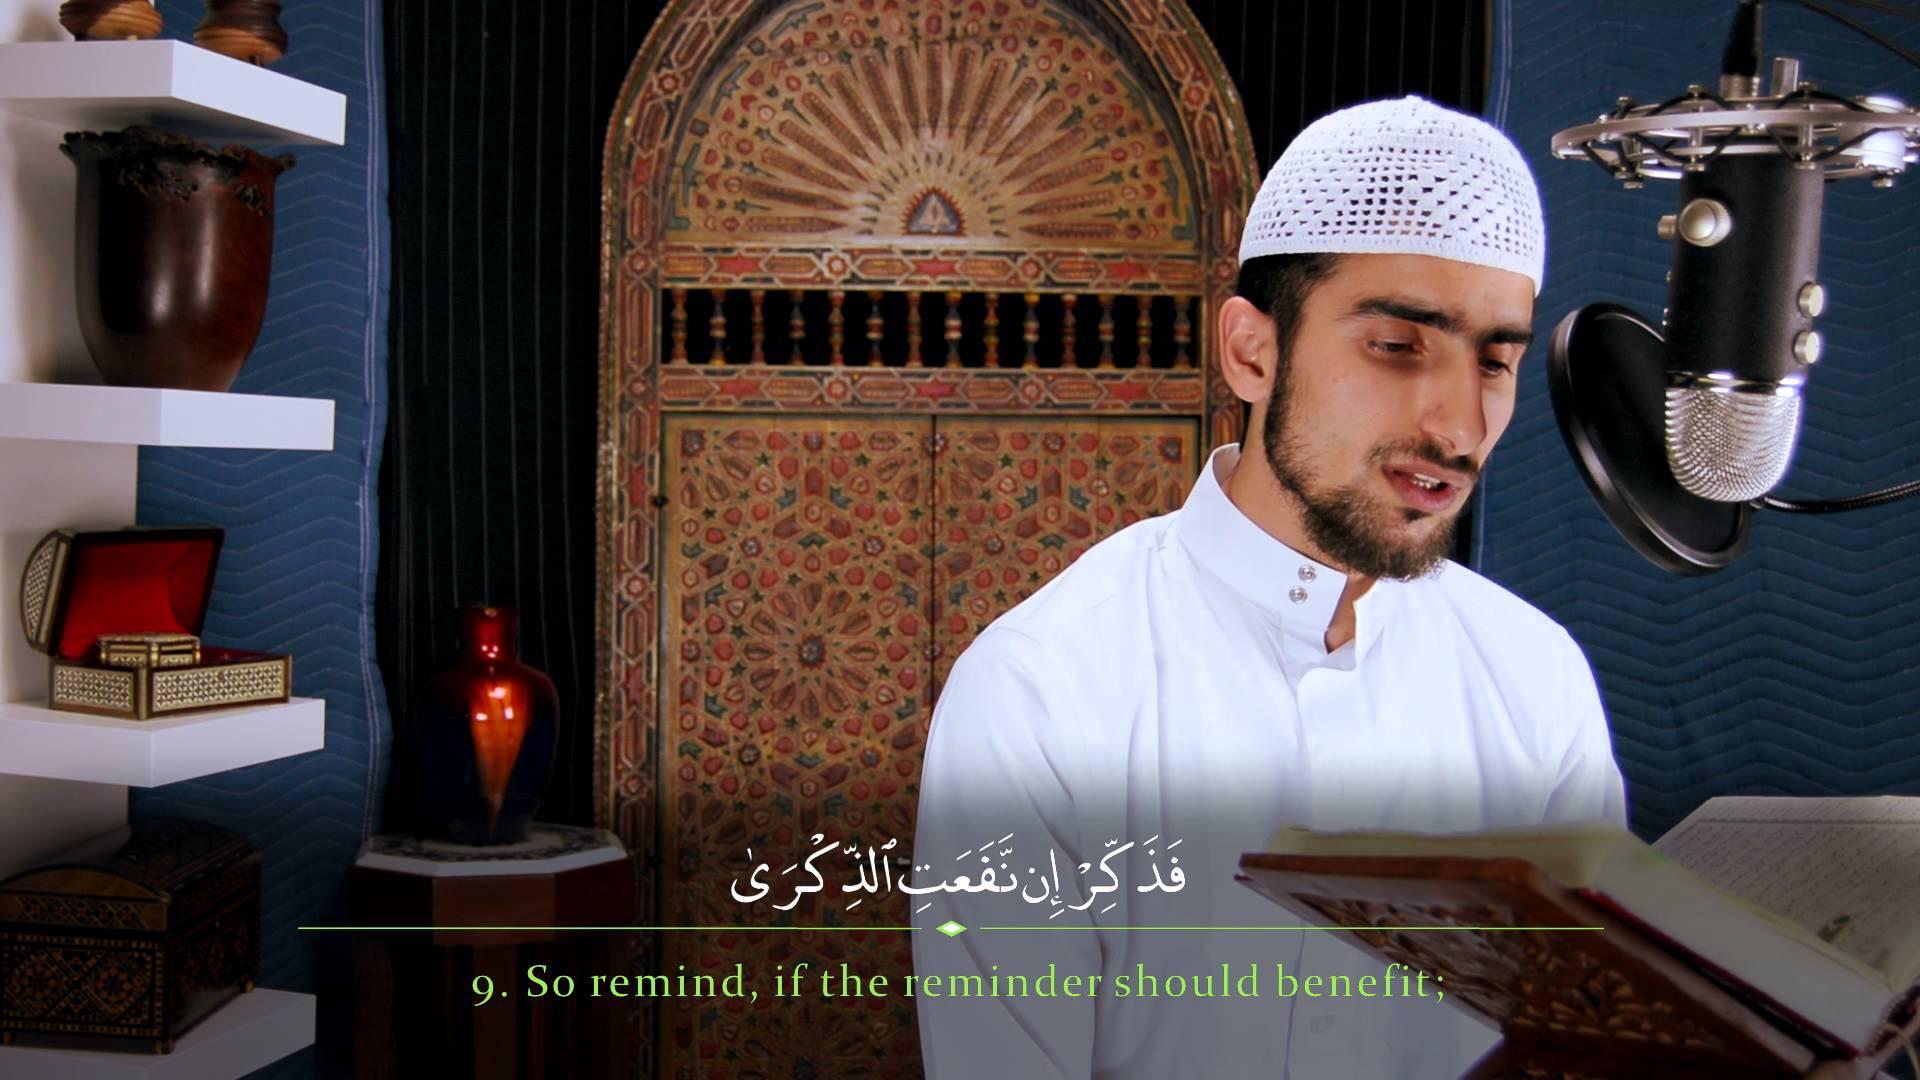 Beautiful Surah al A'la | Hyder al Janaabi سورة الأعلى